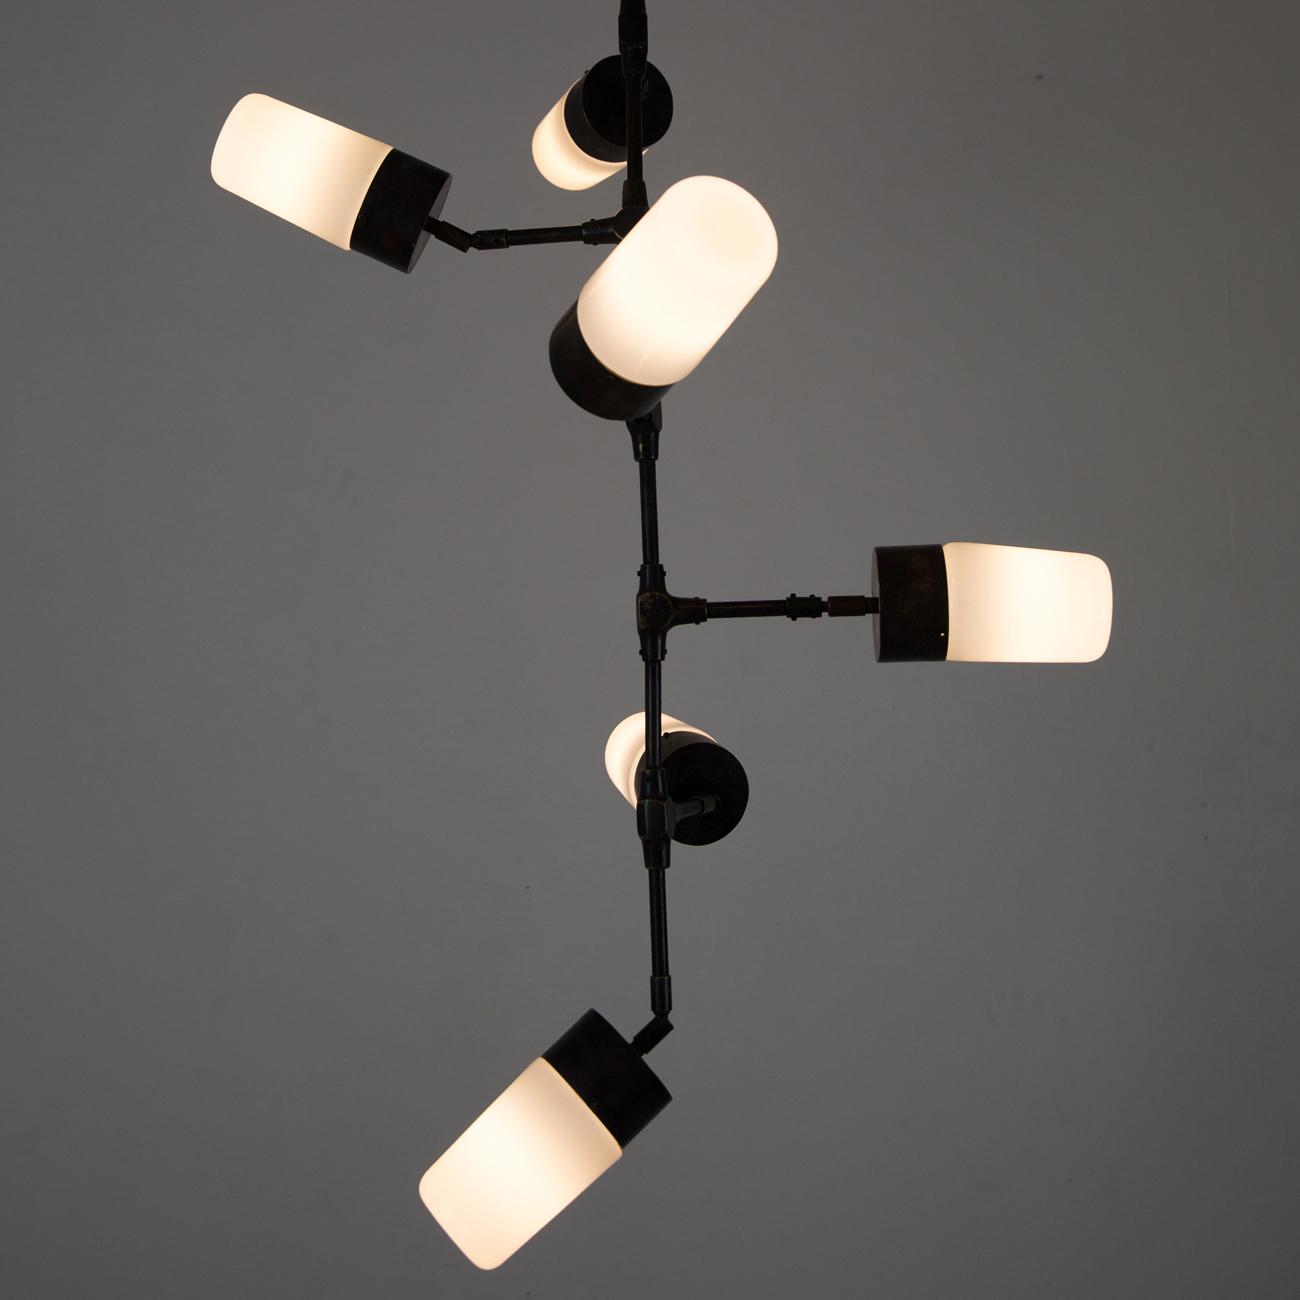 Pendant-Model-03-lit-whole2.jpg